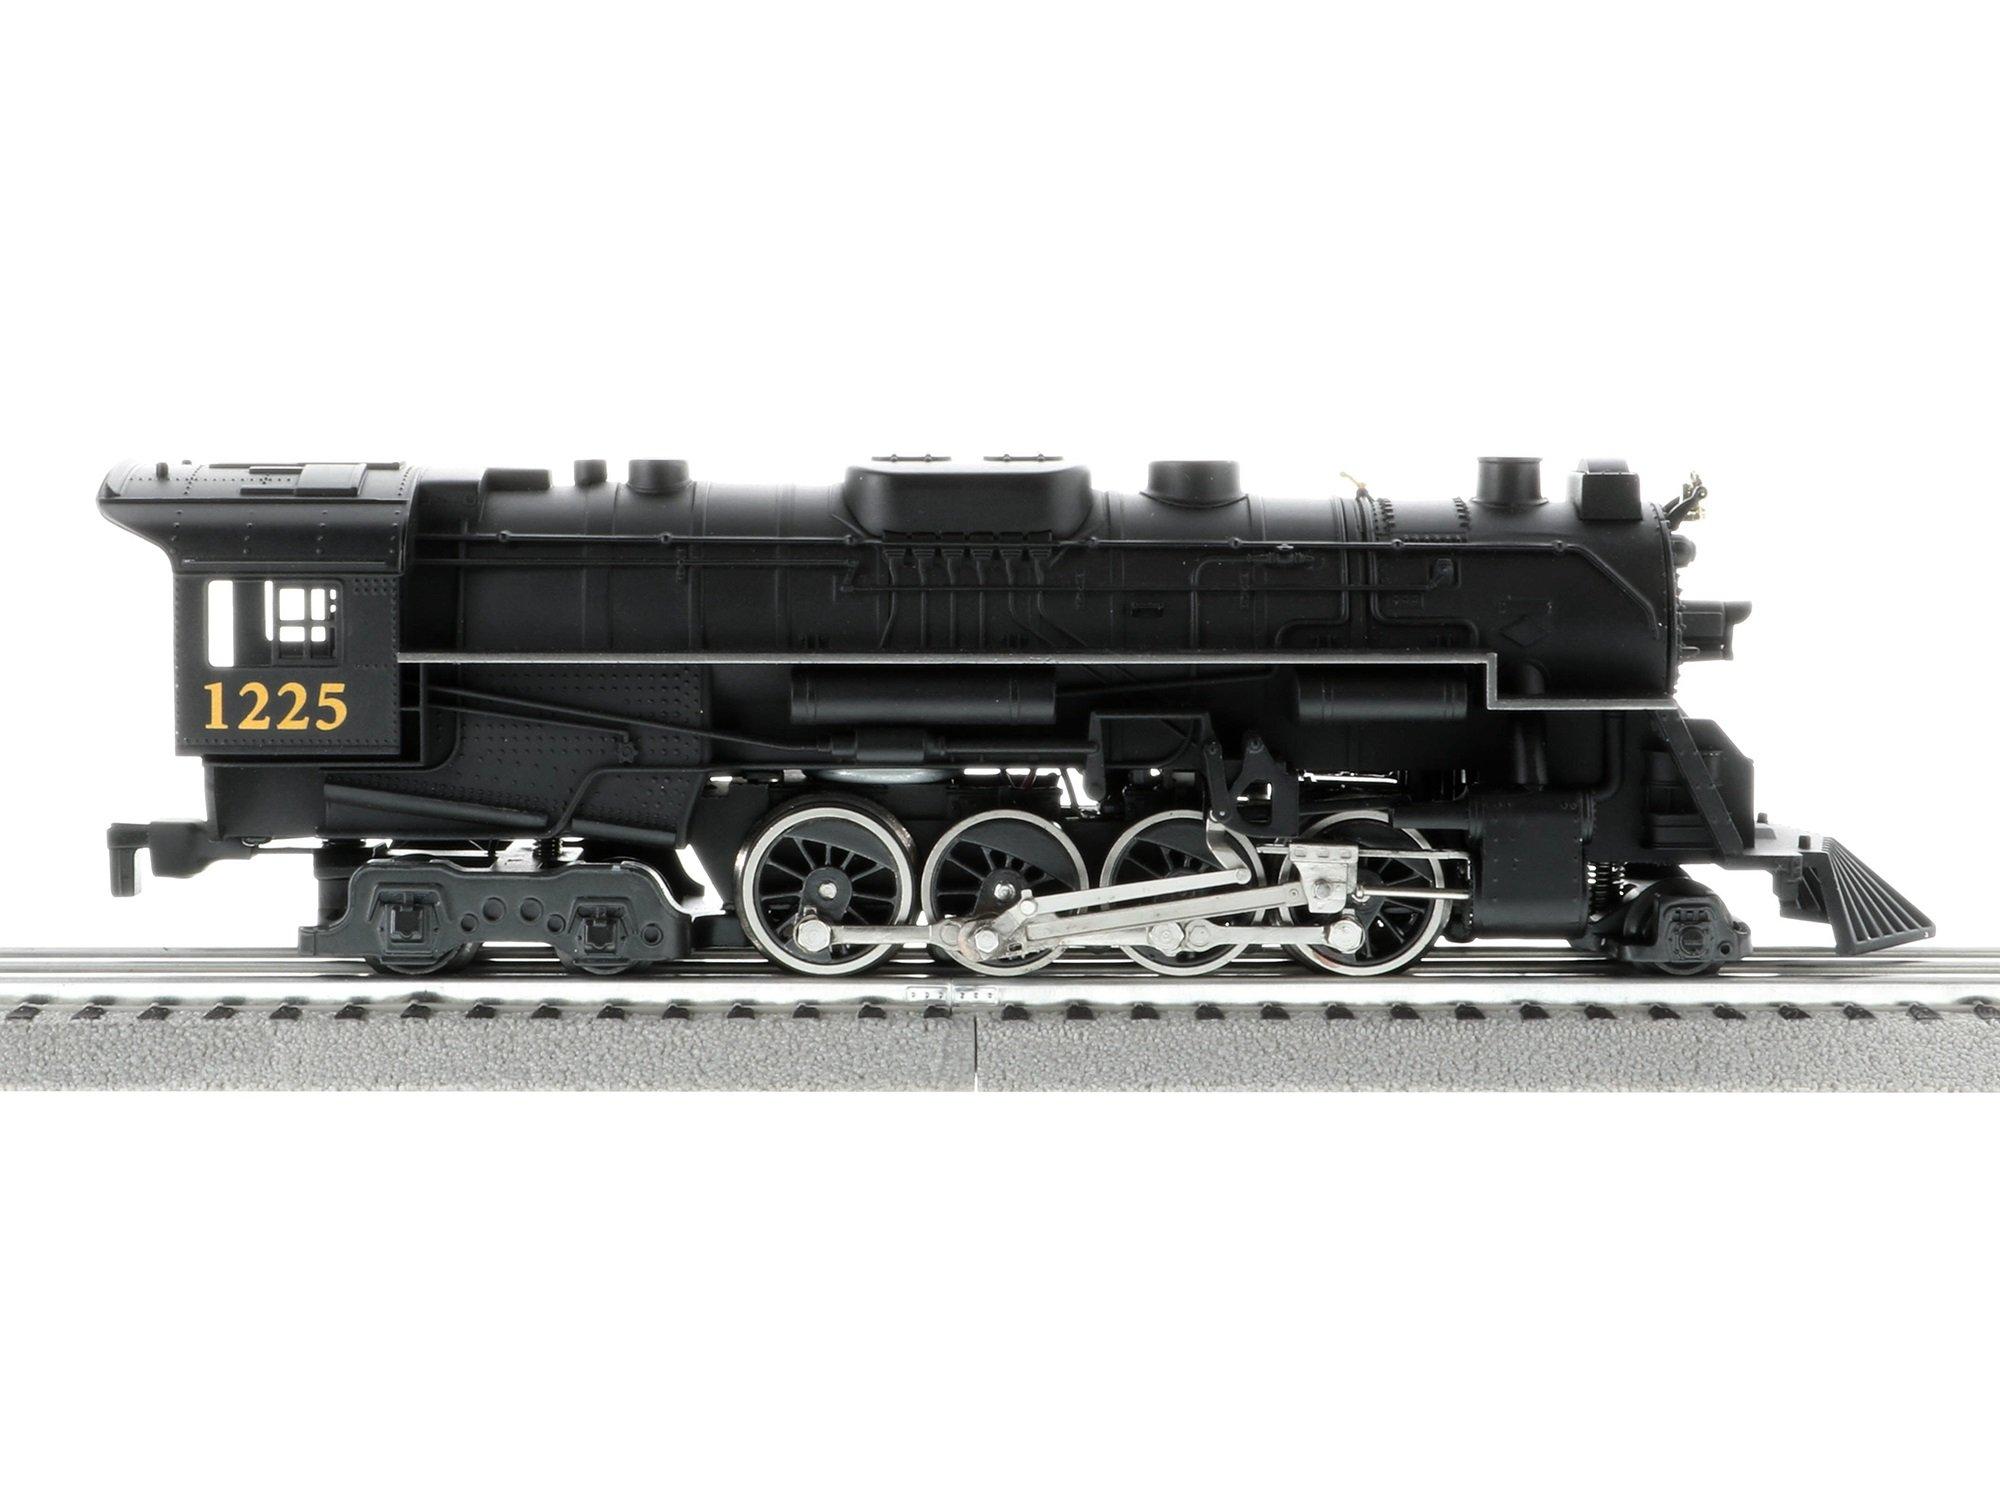 Lionel The Polar Express LionChief Train Set with Bluetooth Train Set by Lionel (Image #6)